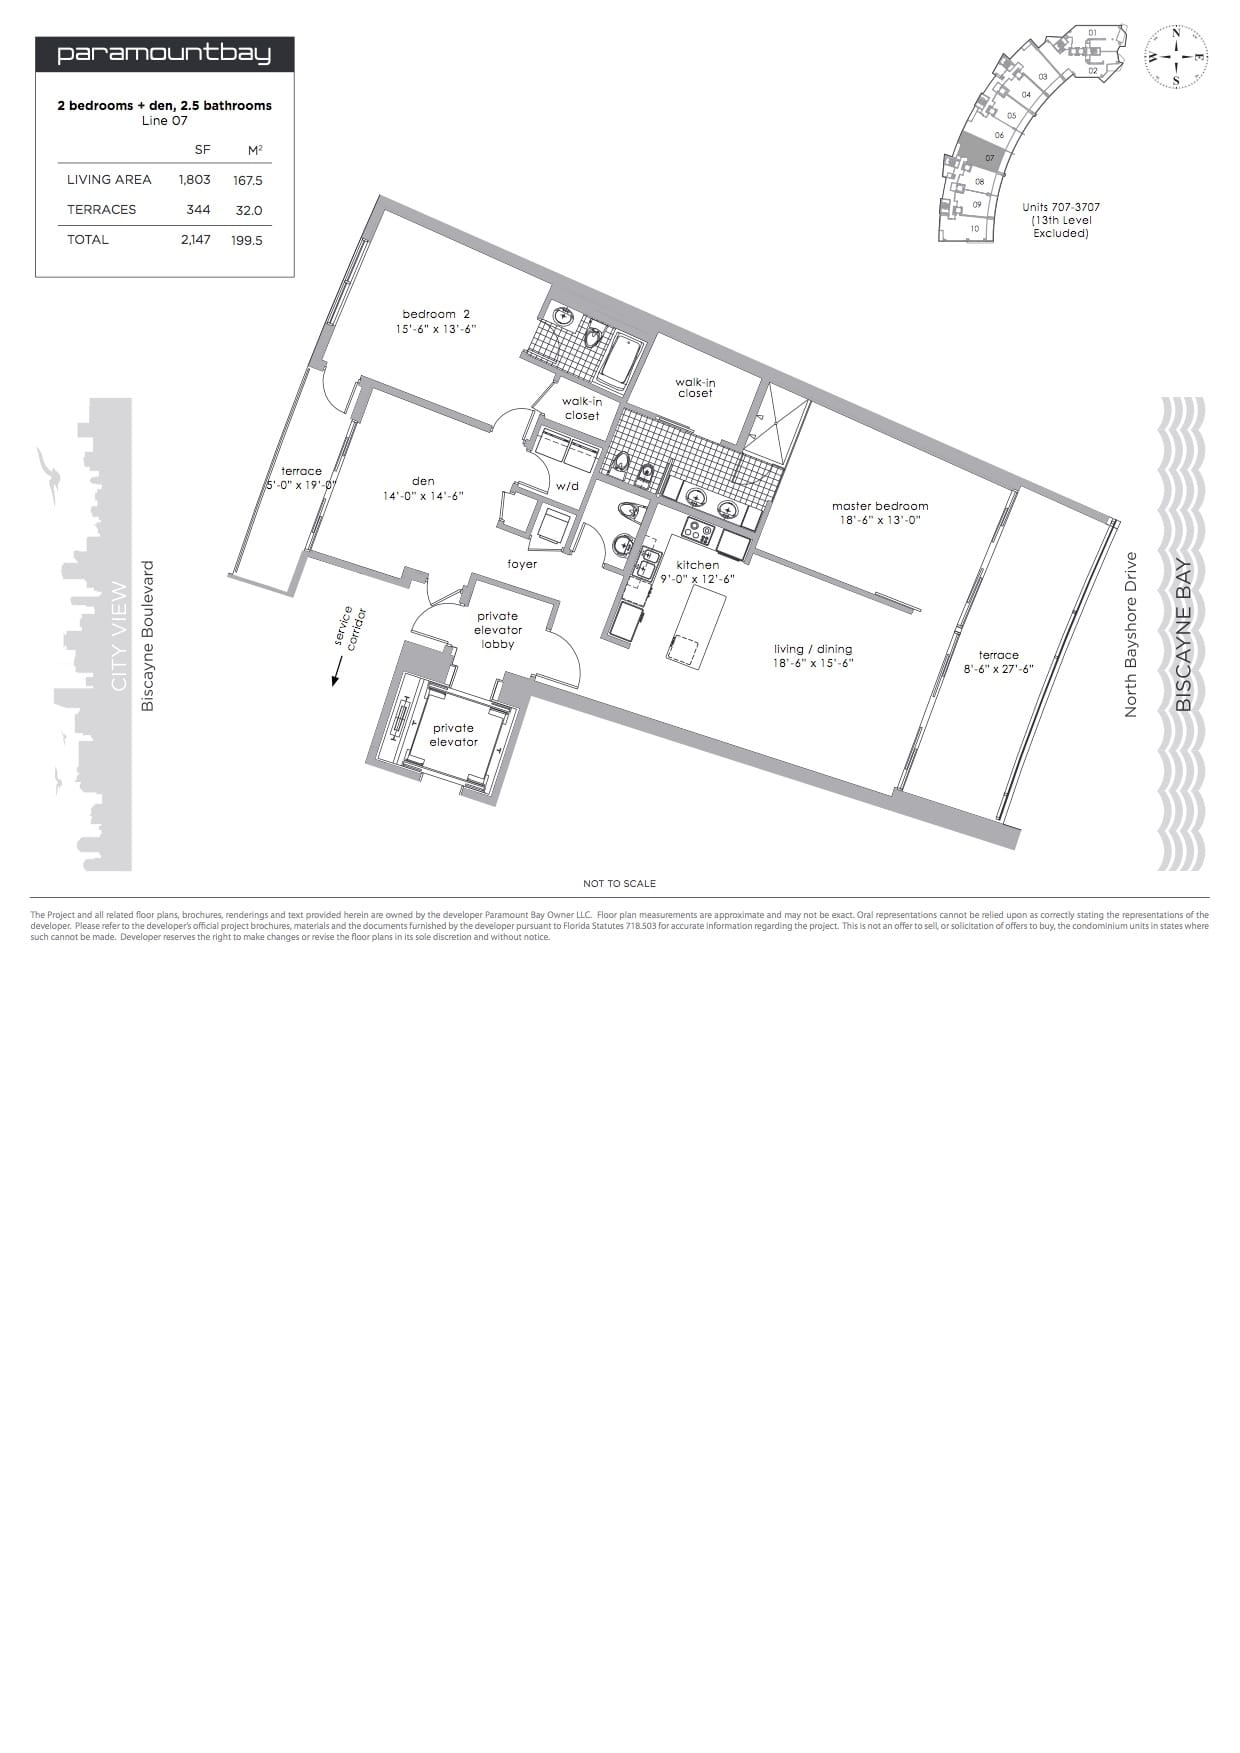 Paramount Bay Floor Plans Paramountbaycondosforsale Com